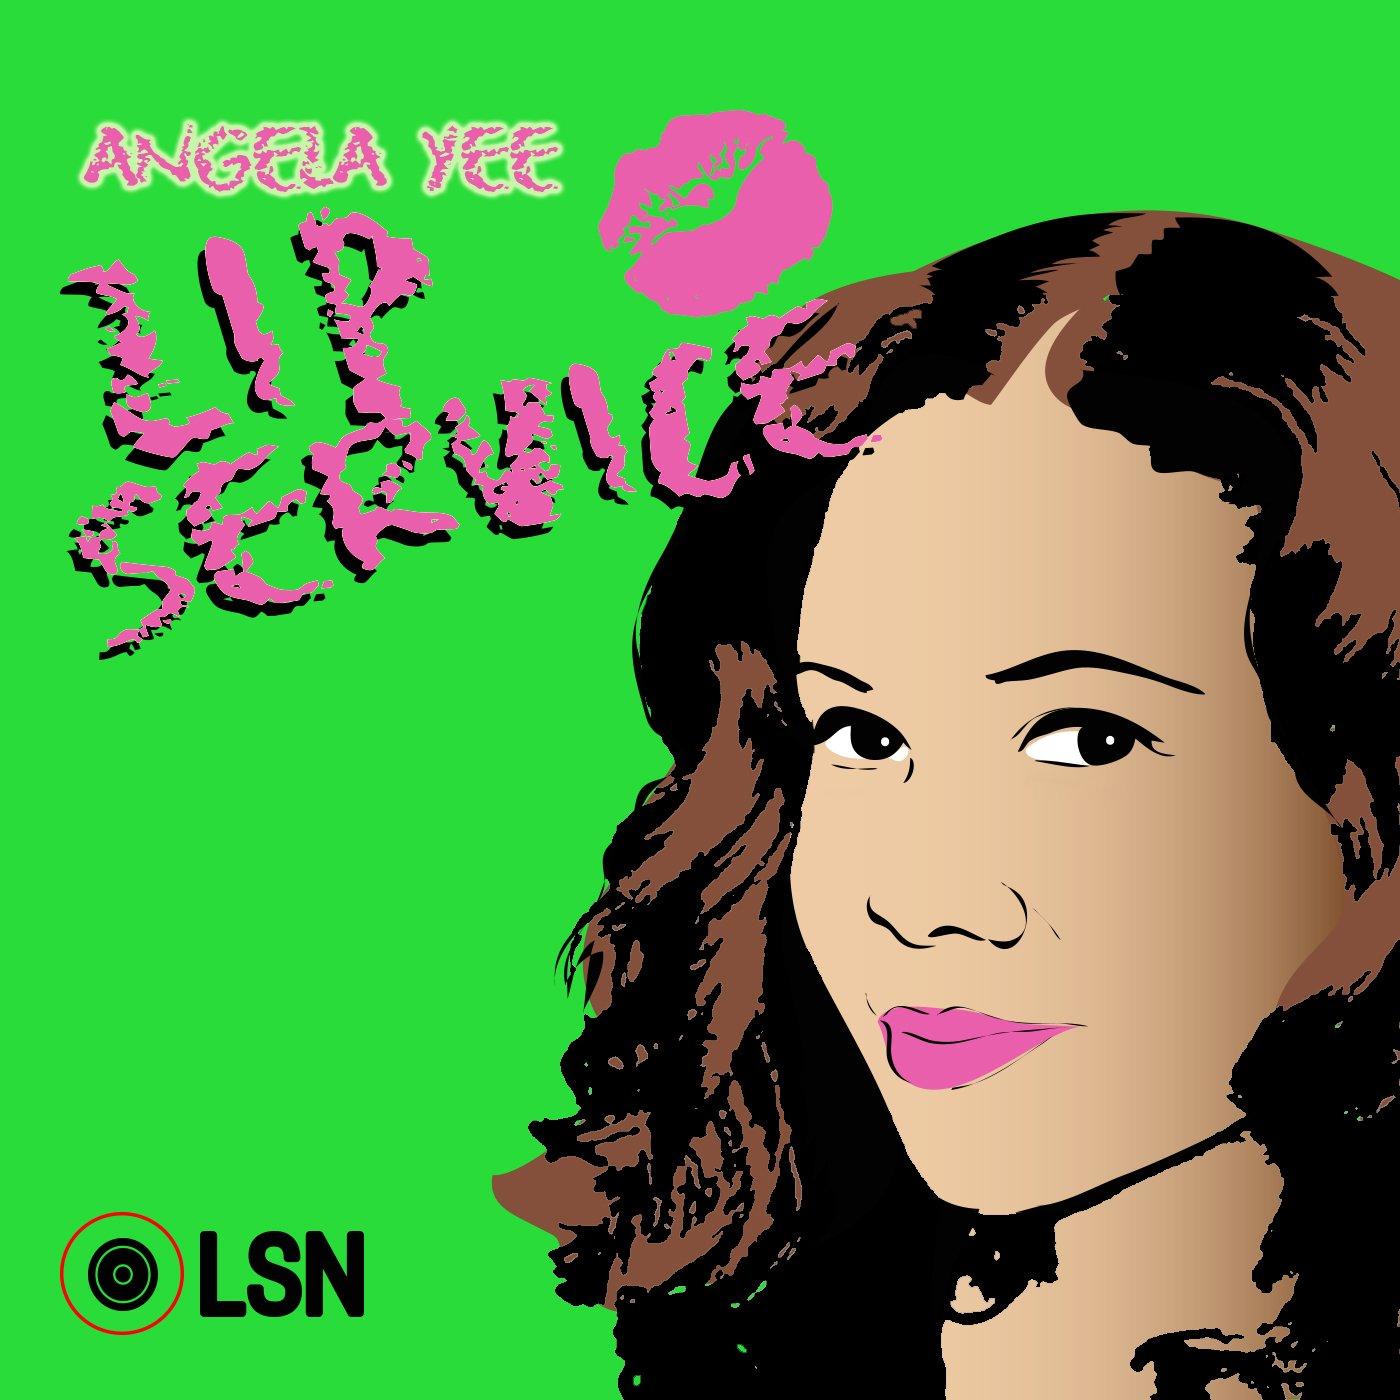 Angela Yee Cyn Santana Lip Service